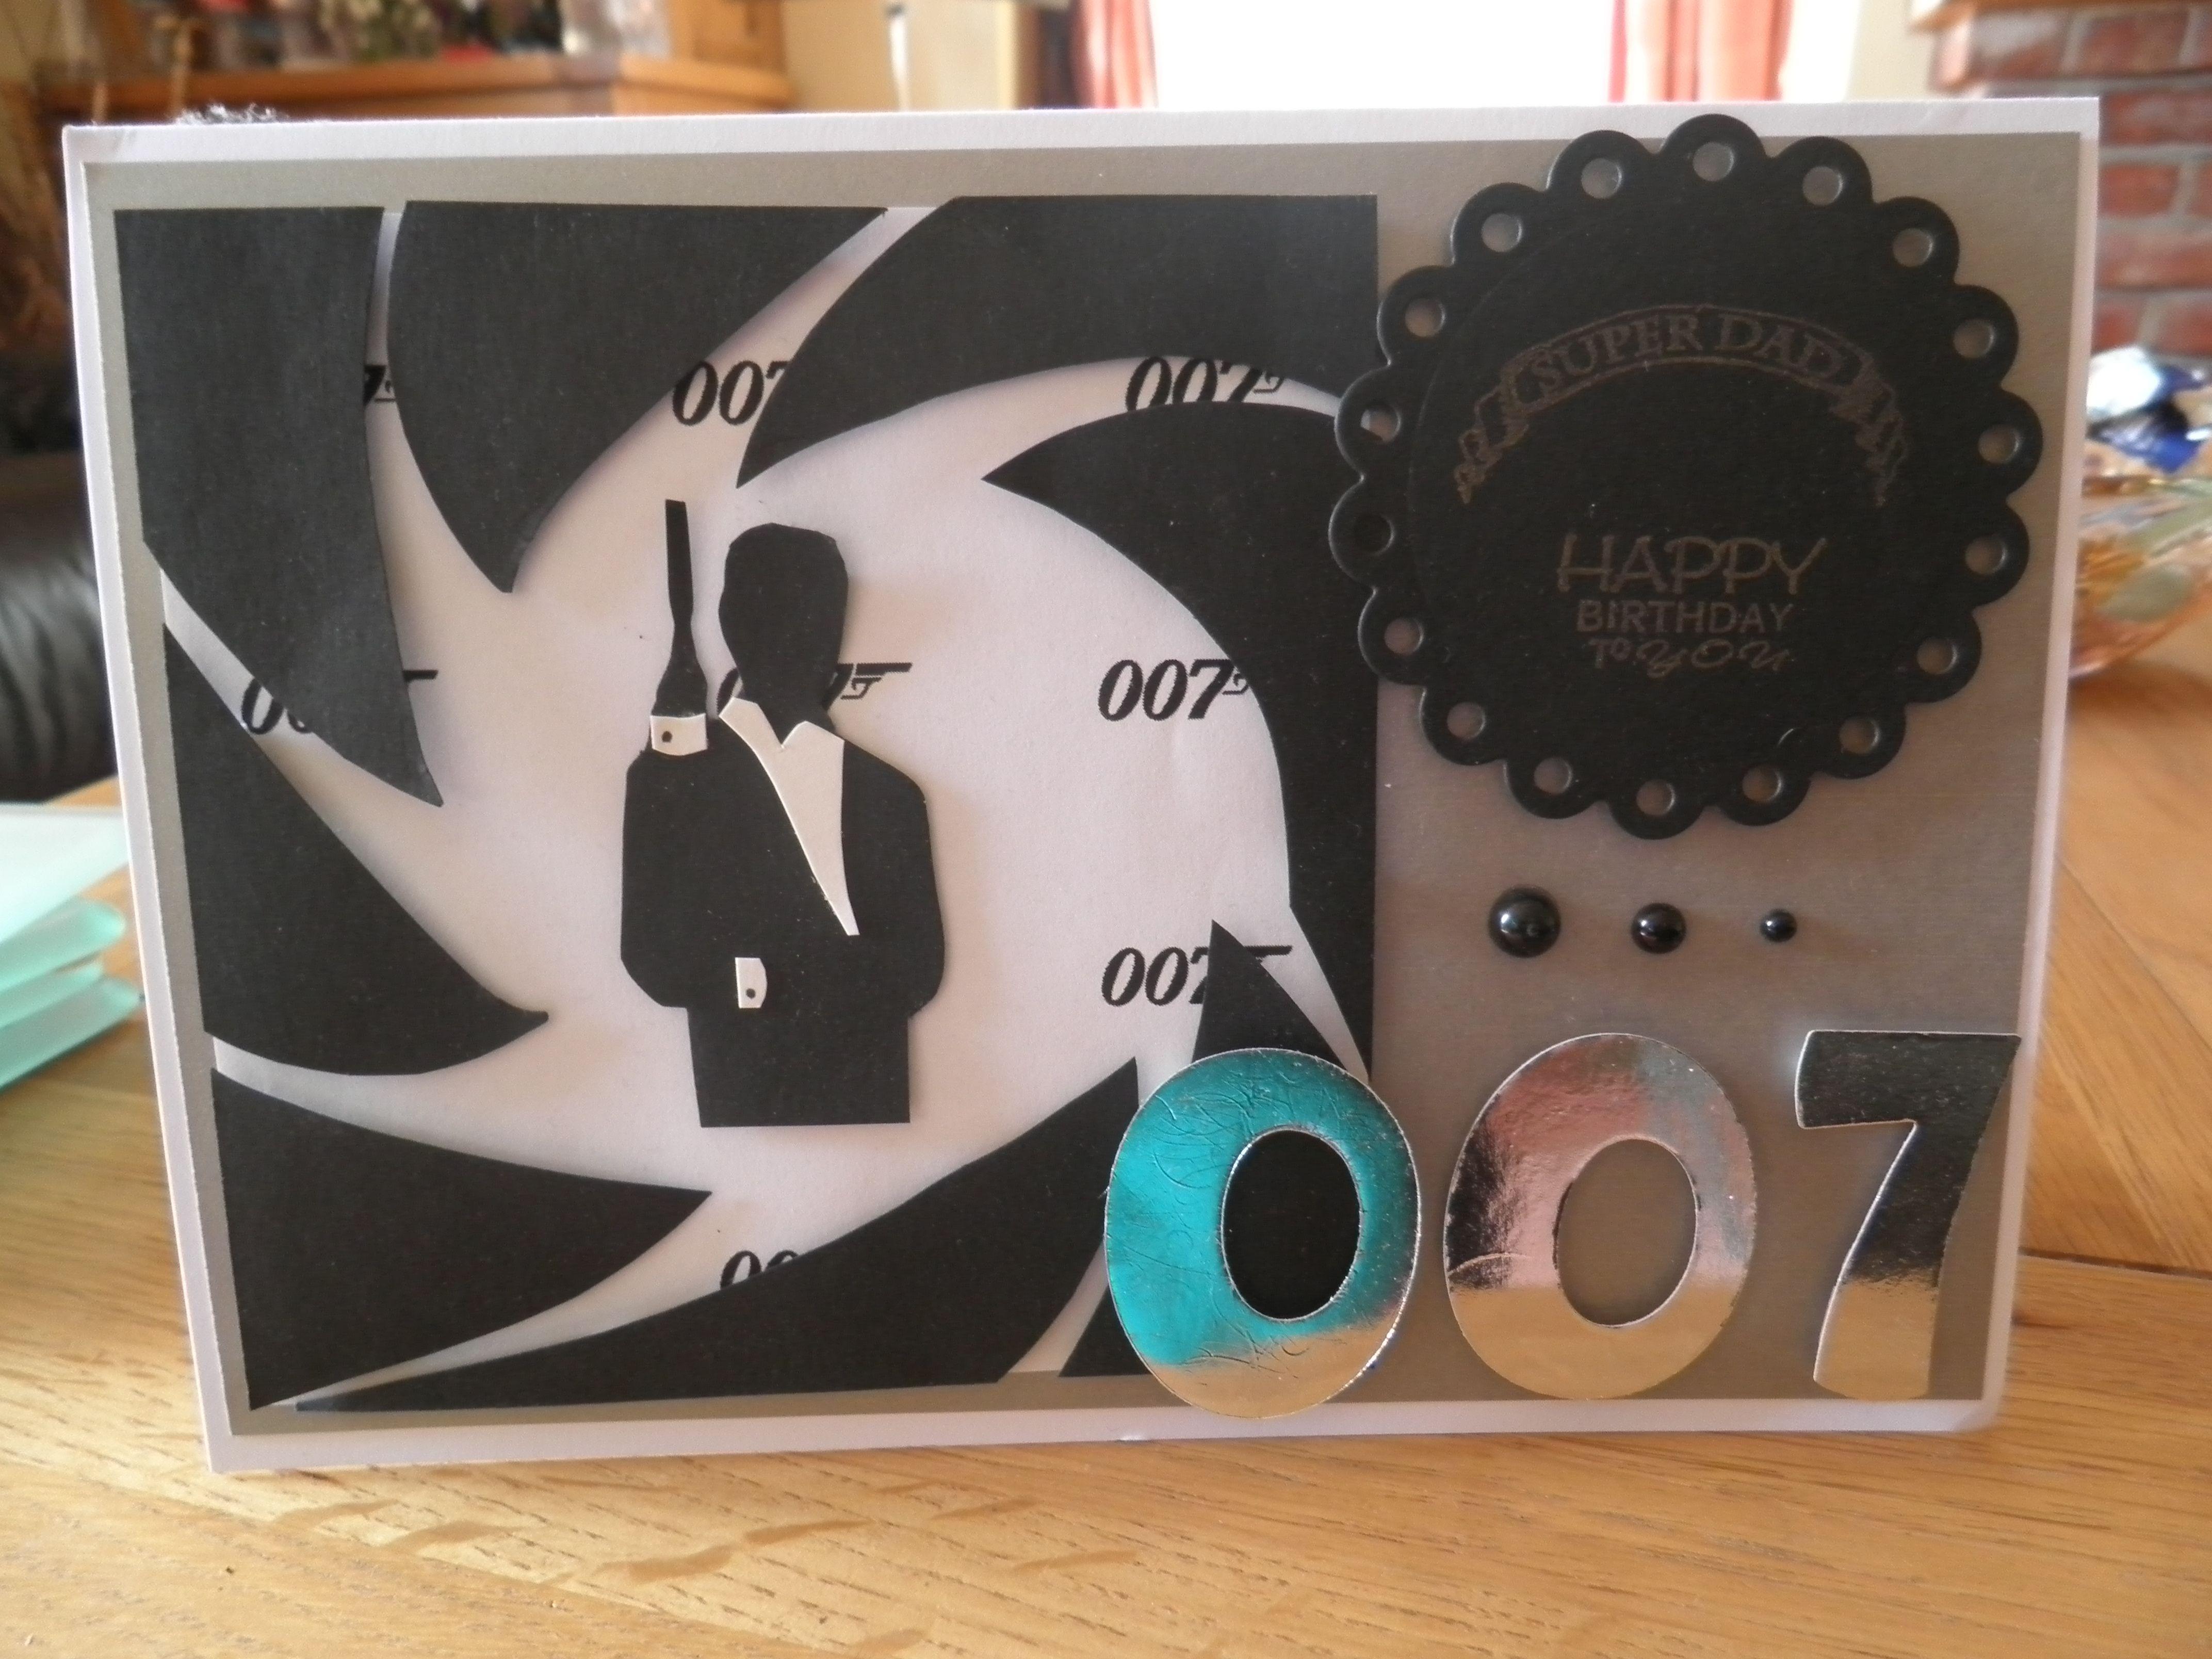 James Bond 007 Theme Birthday Card – James Bond Birthday Cards